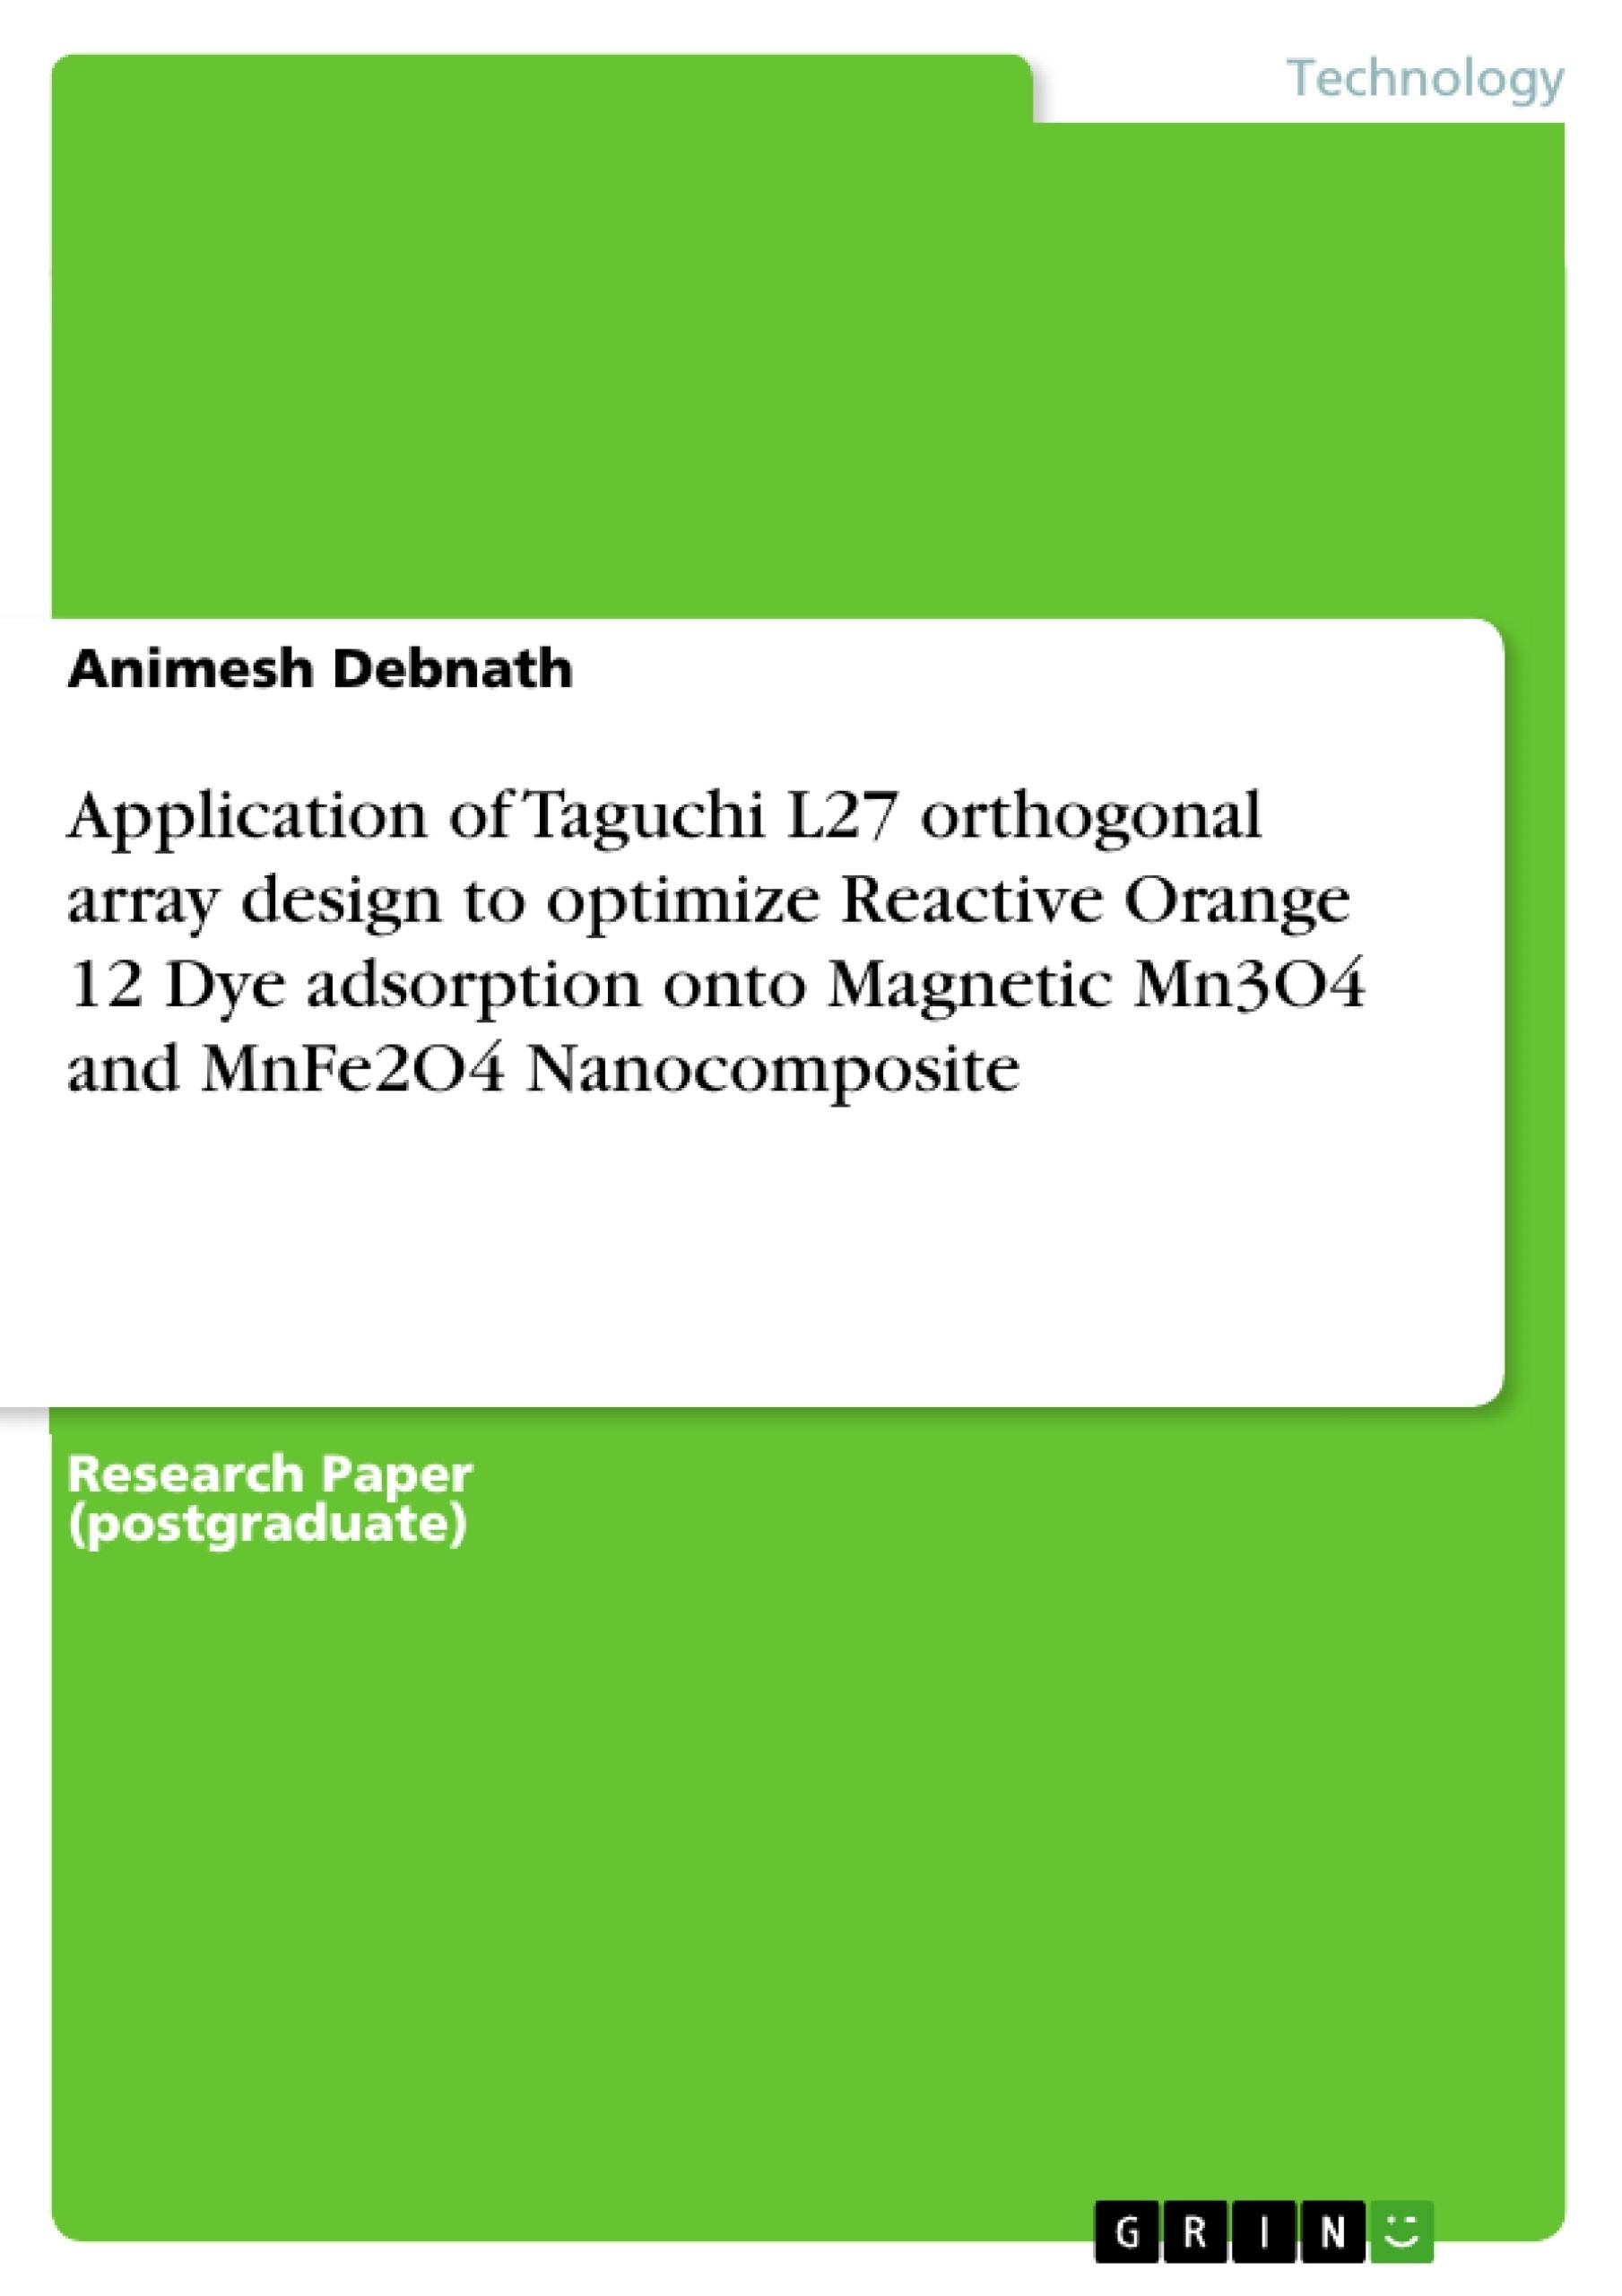 Title: Application of Taguchi L27 orthogonal array design to optimize Reactive Orange 12 Dye adsorption onto Magnetic Mn3O4 and MnFe2O4 Nanocomposite